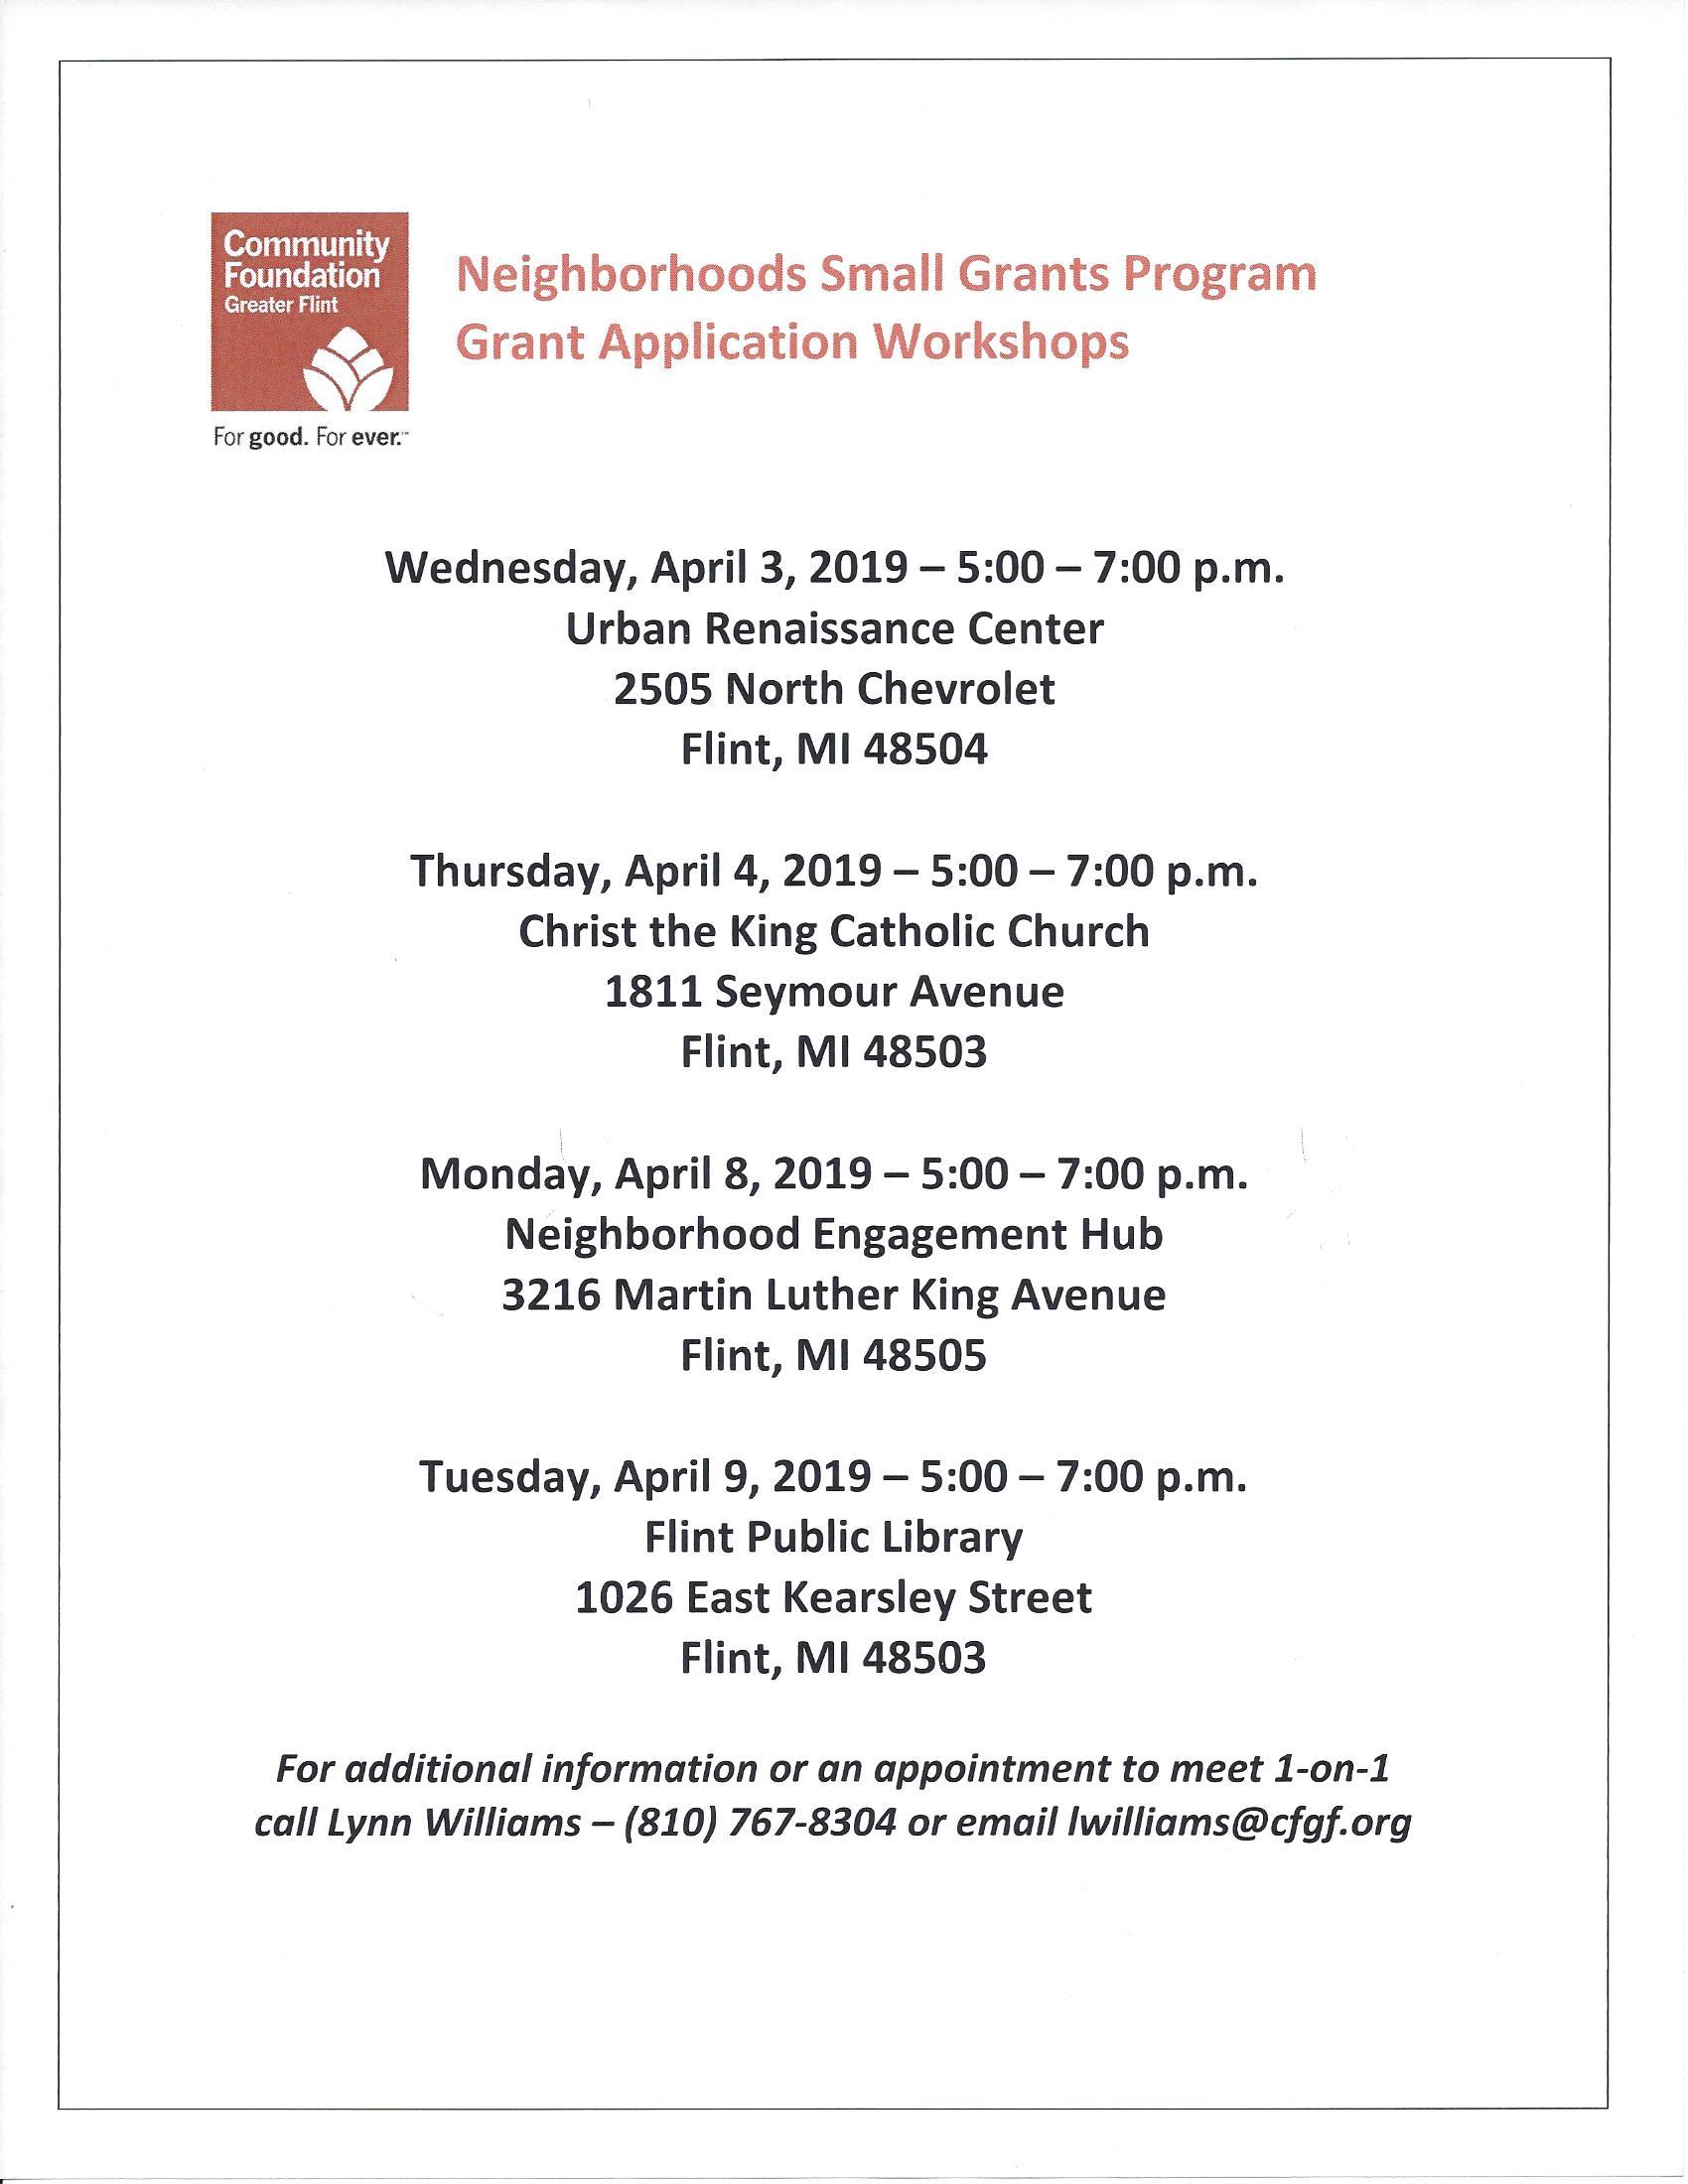 Community Foundation Grants Workshop